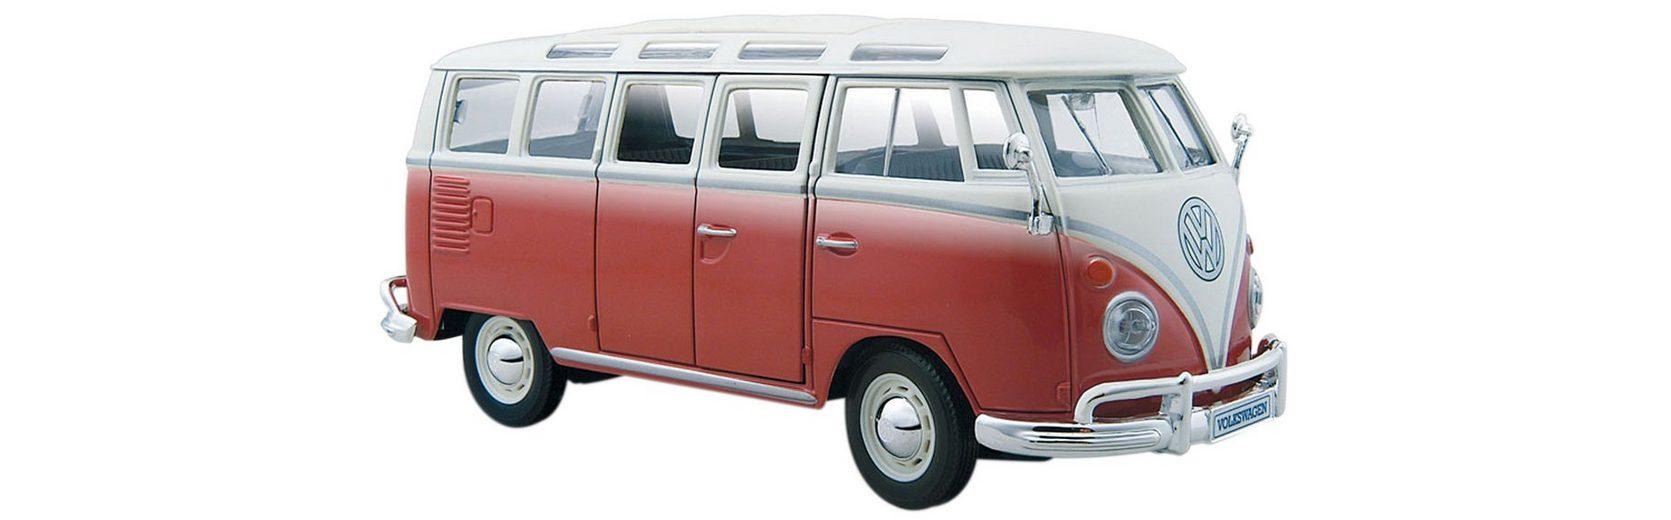 Maisto® Sammlerauto, 1:25, »VW Bus Samba«